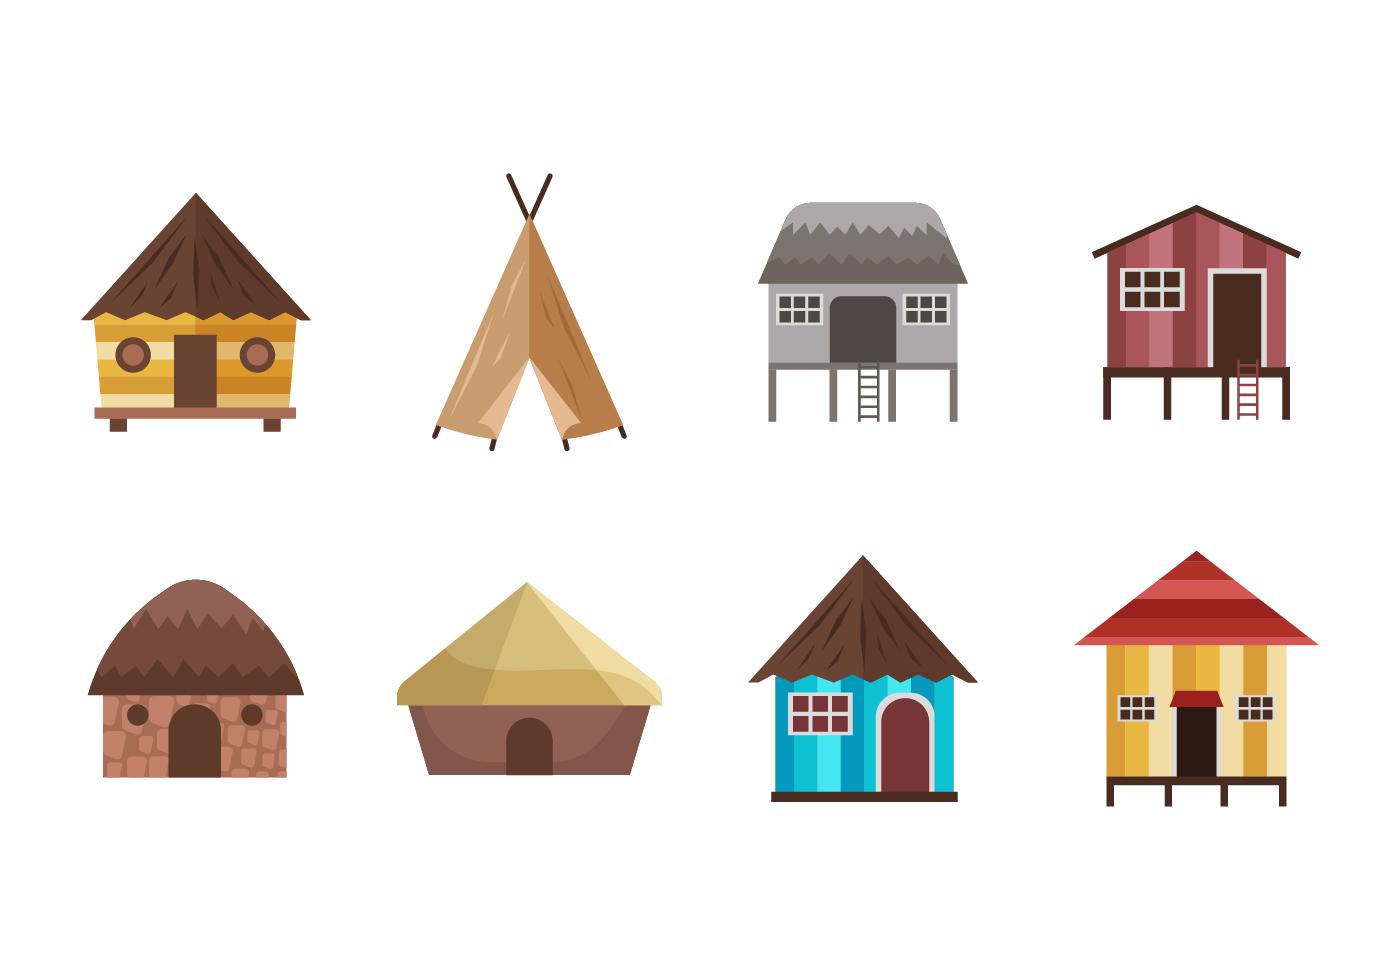 Hut Free Vector Art - (6038 Free Downloads)